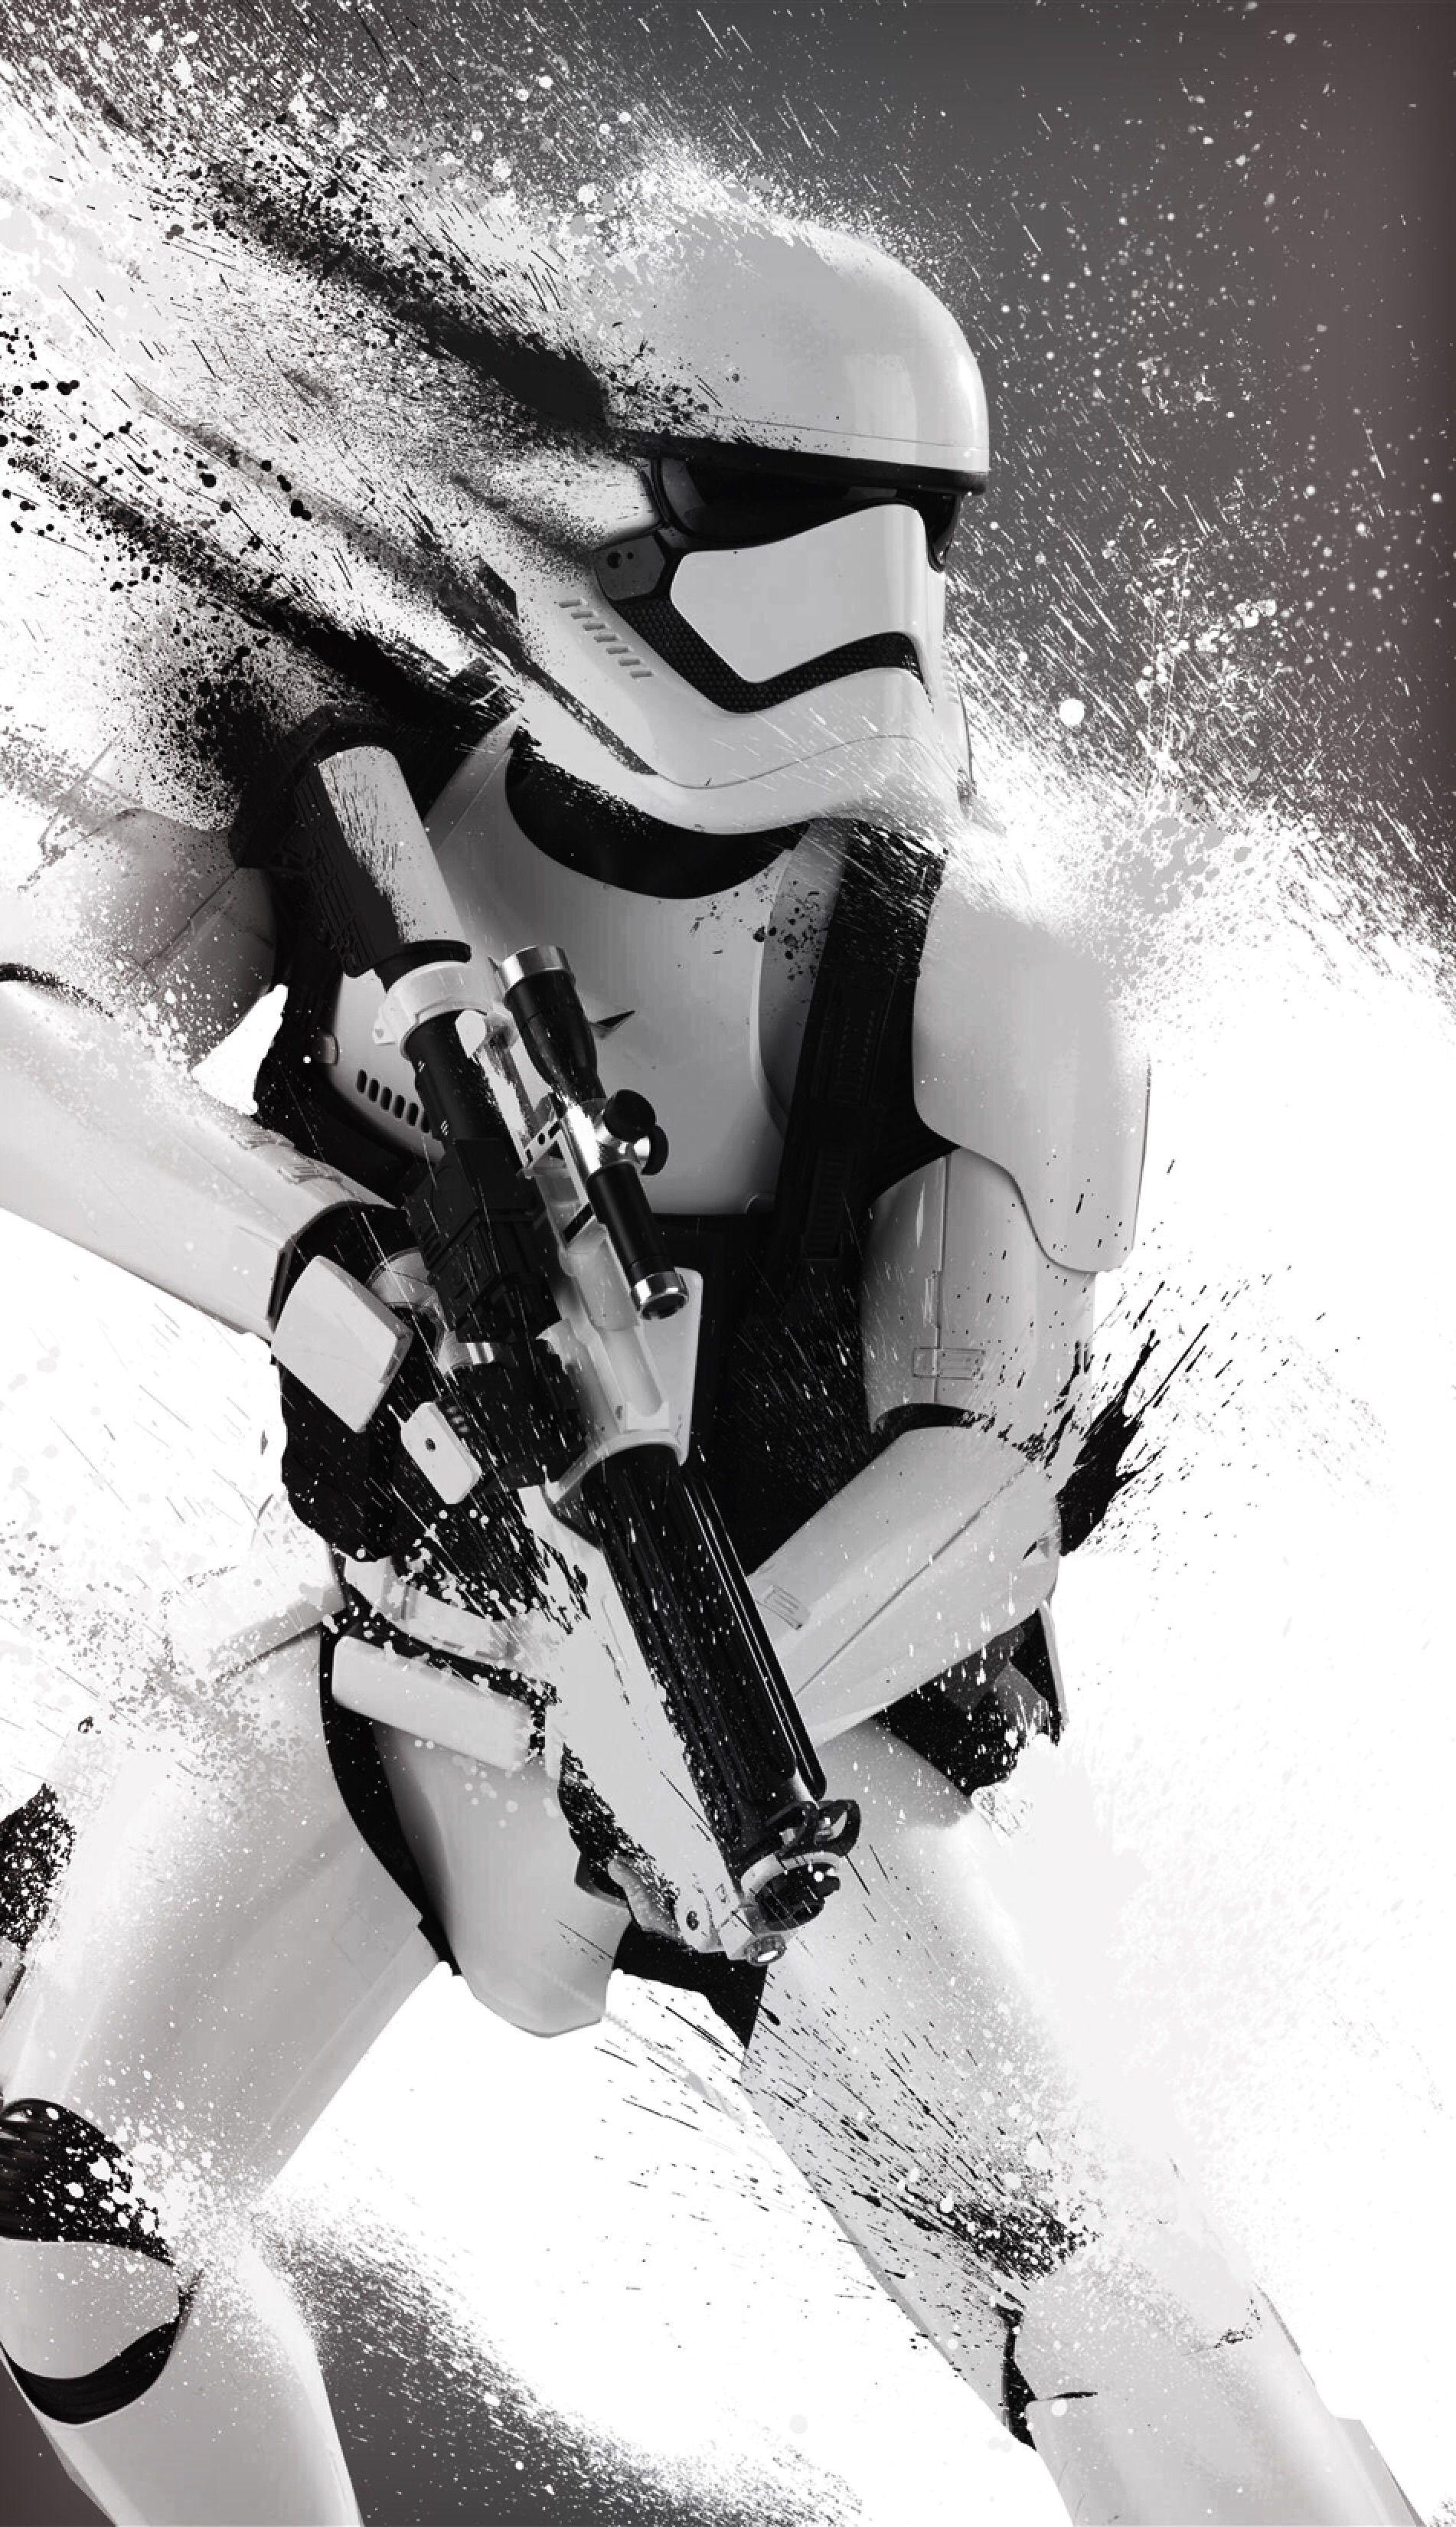 Amazing Stormtrooper Wallpaper Star wars poster, Star